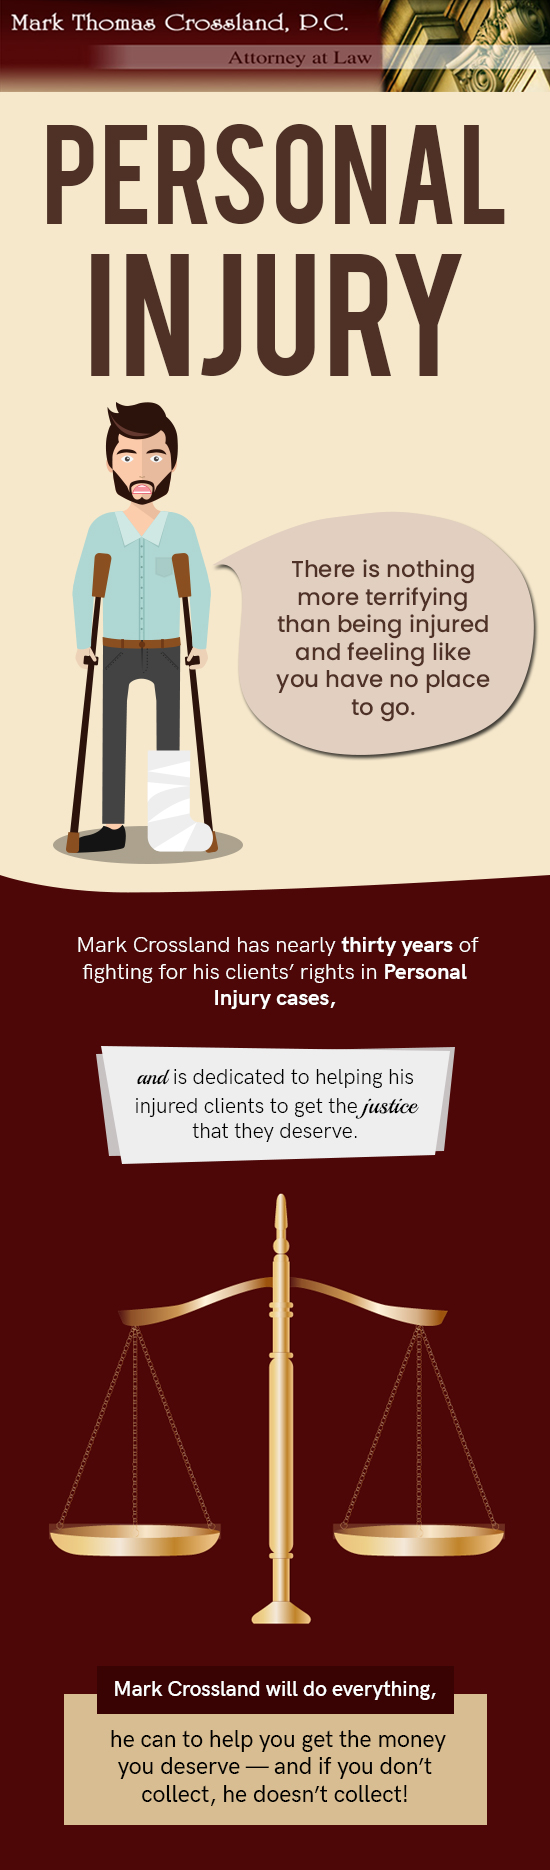 Mark Thomas Crossland, P.C. – A Team of Woodbridge's Trusted Personal Injury Attorneys